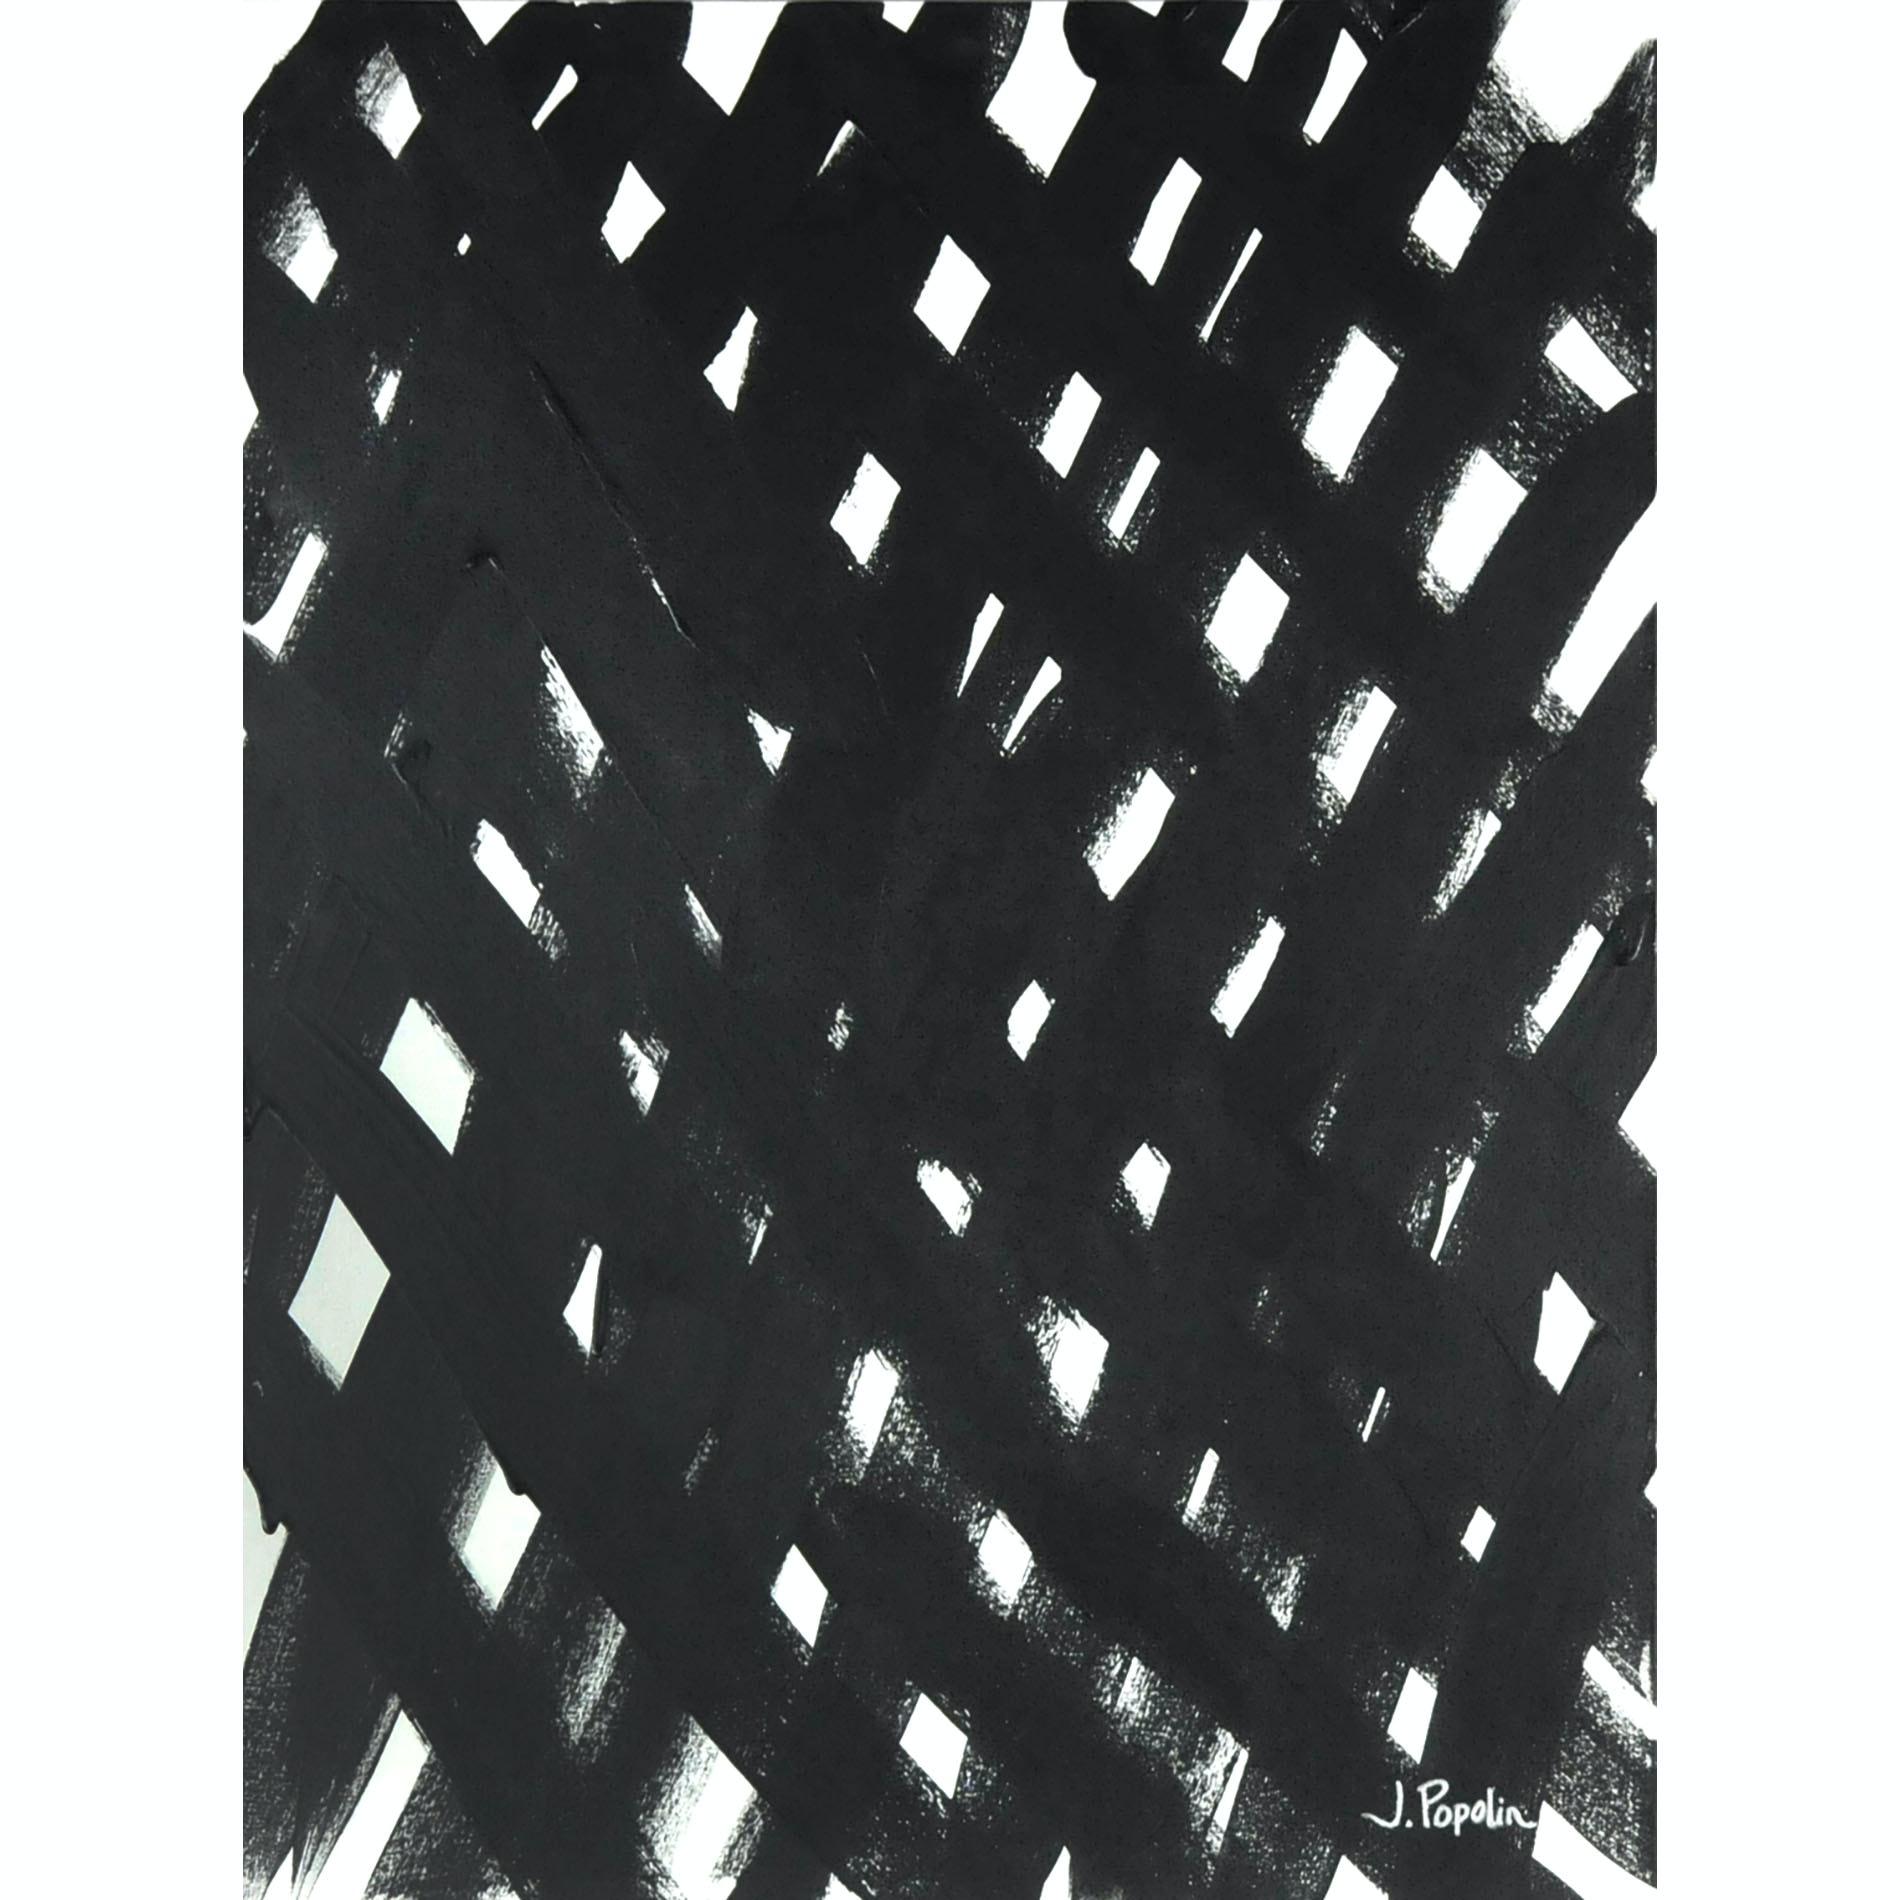 "J. Popolin Original Acrylic on Canvas ""Black and White Weaving"""